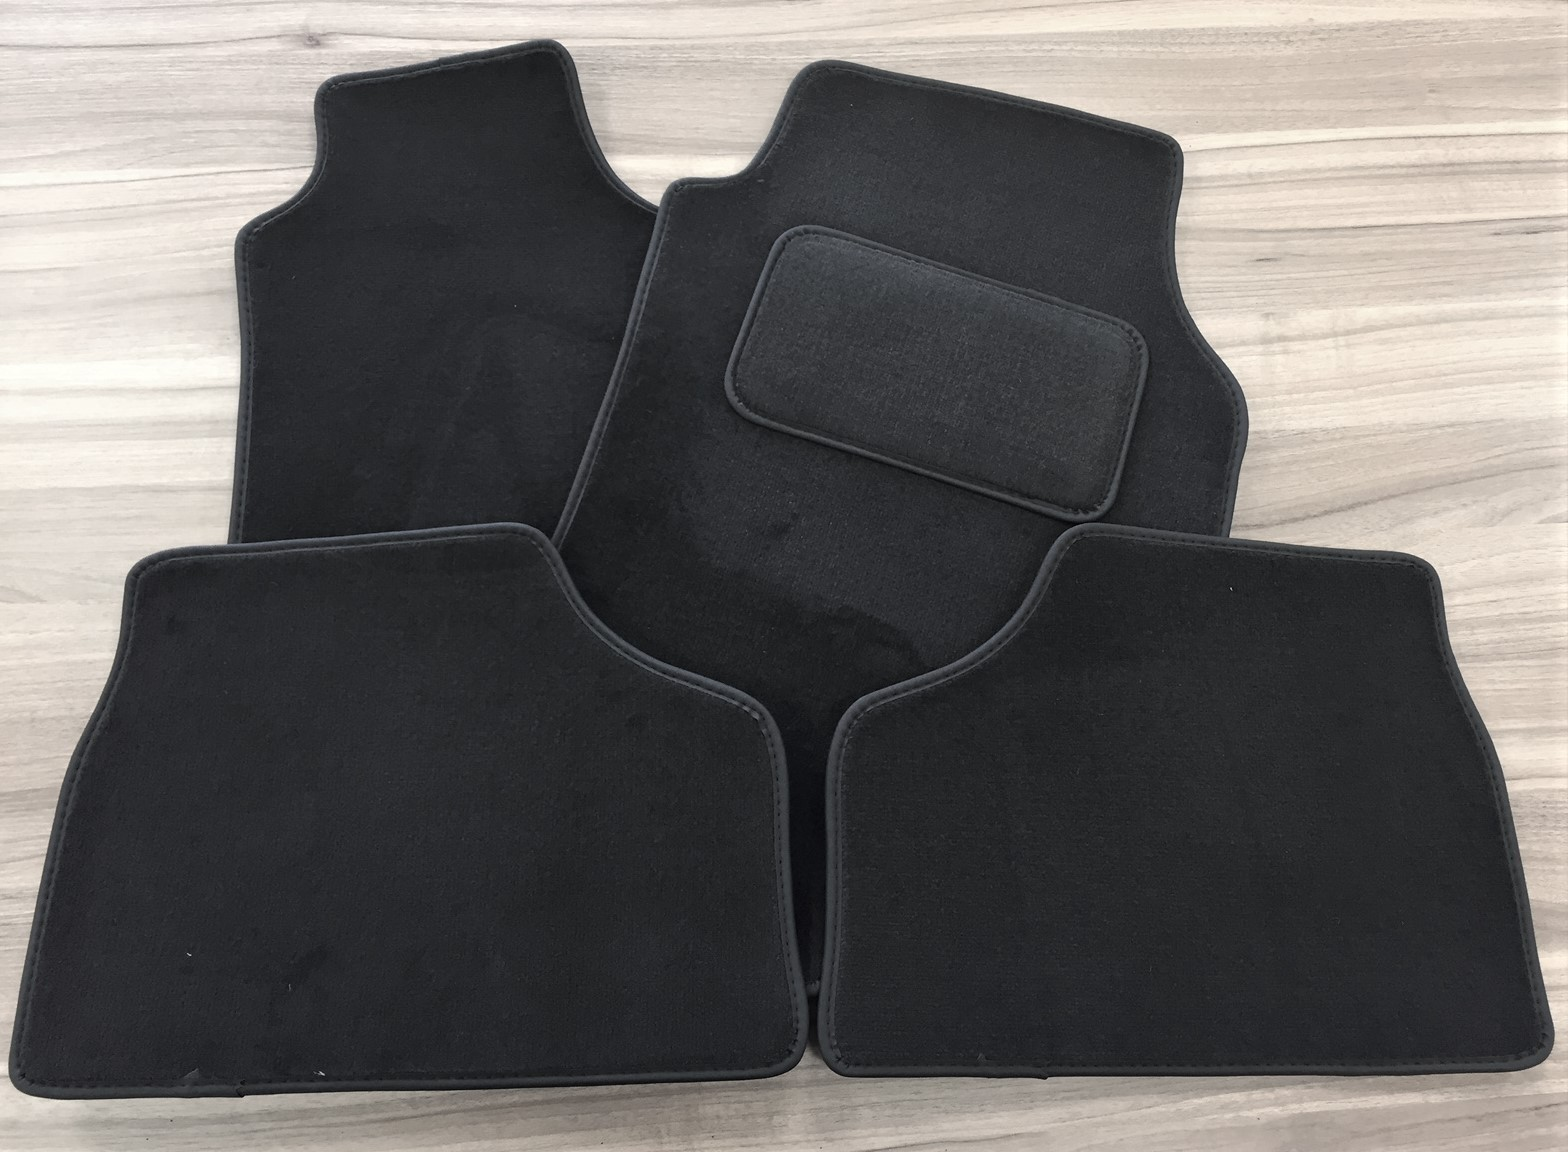 hight resolution of 91132329 vauxhall astra mkiv g 98 04 tailored carpet floor mats set deluxe black oe